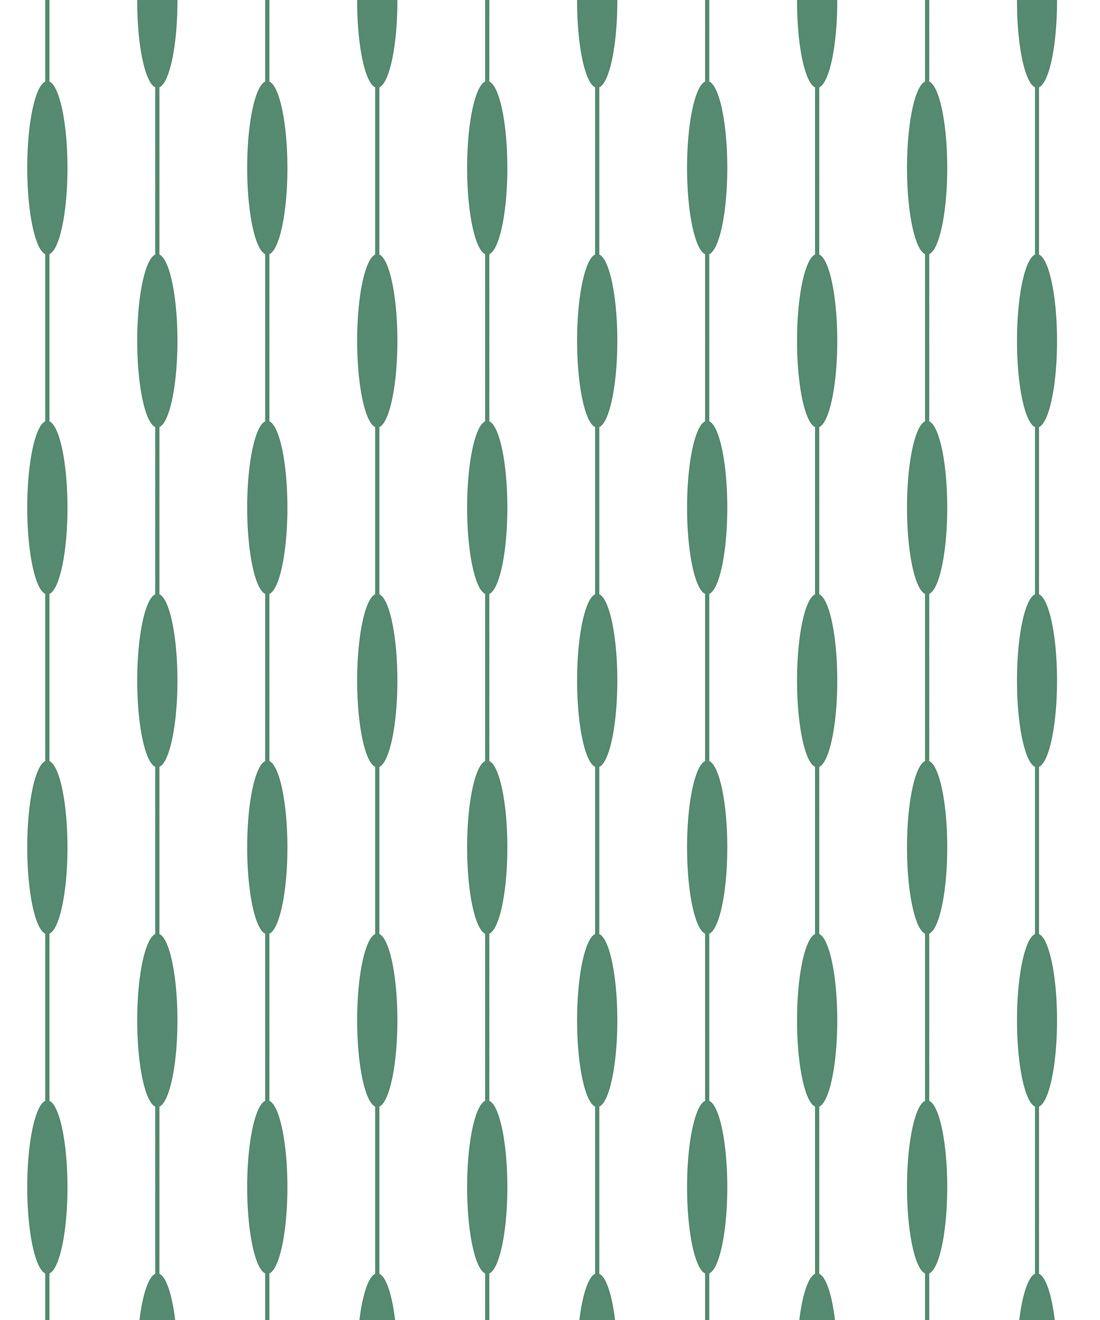 Bowline Wallpaper • Geometric Wallpaper • Striped Wallpaper • Green Wallpaper •Swatch